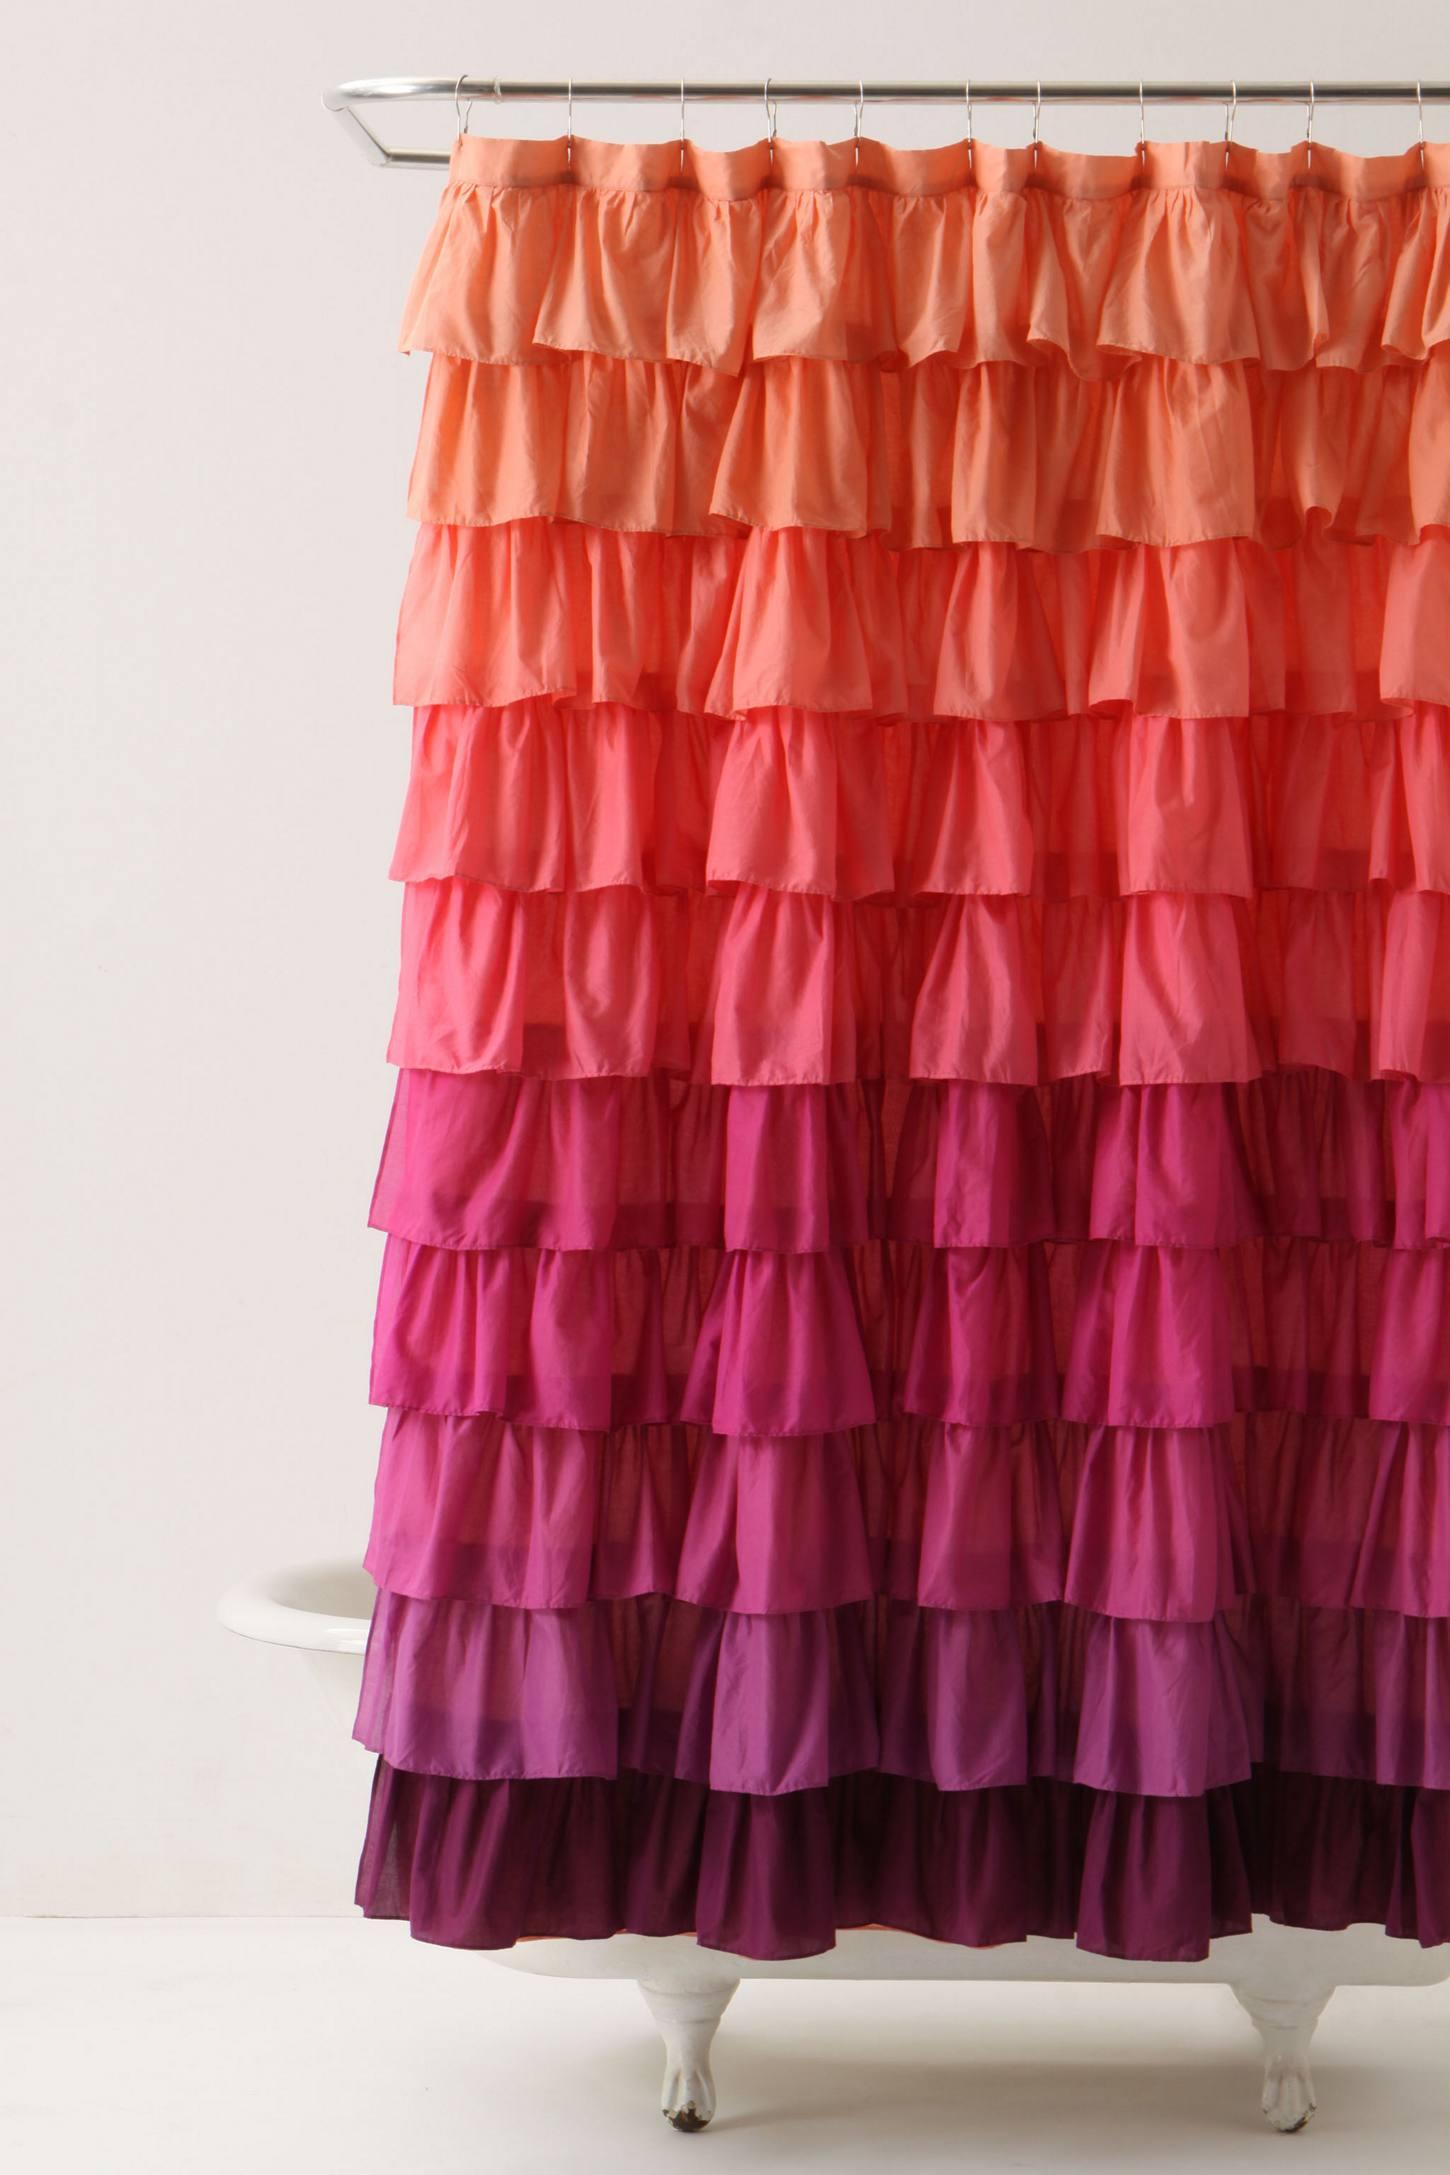 Diy ruffled shower curtain - Diy Ruffled Shower Curtain 52